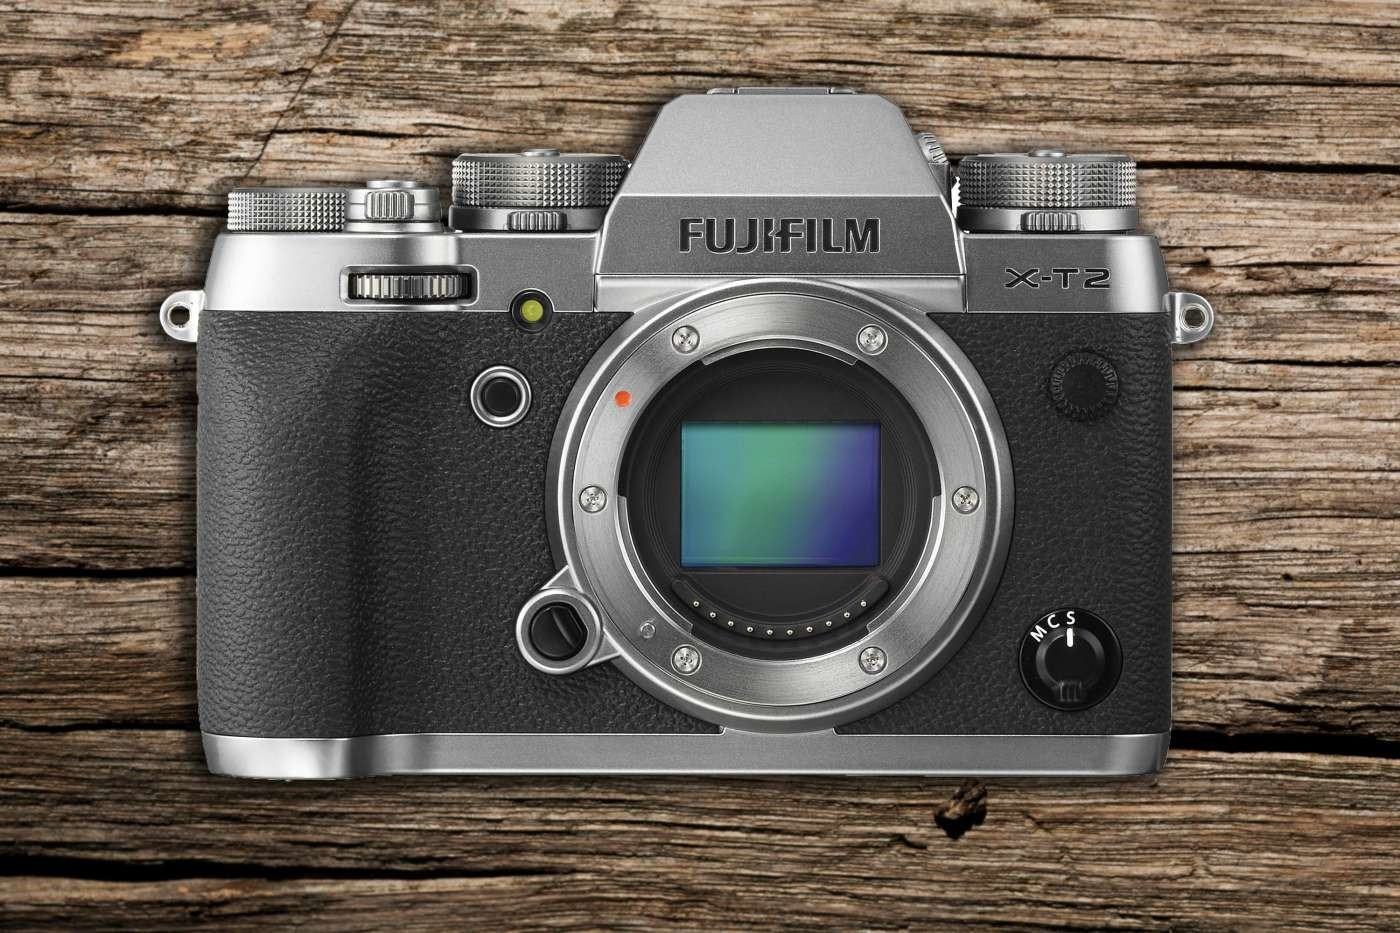 Fujifilm X-E3 в сравнении с Fujifilm X-T2 - что лучше?